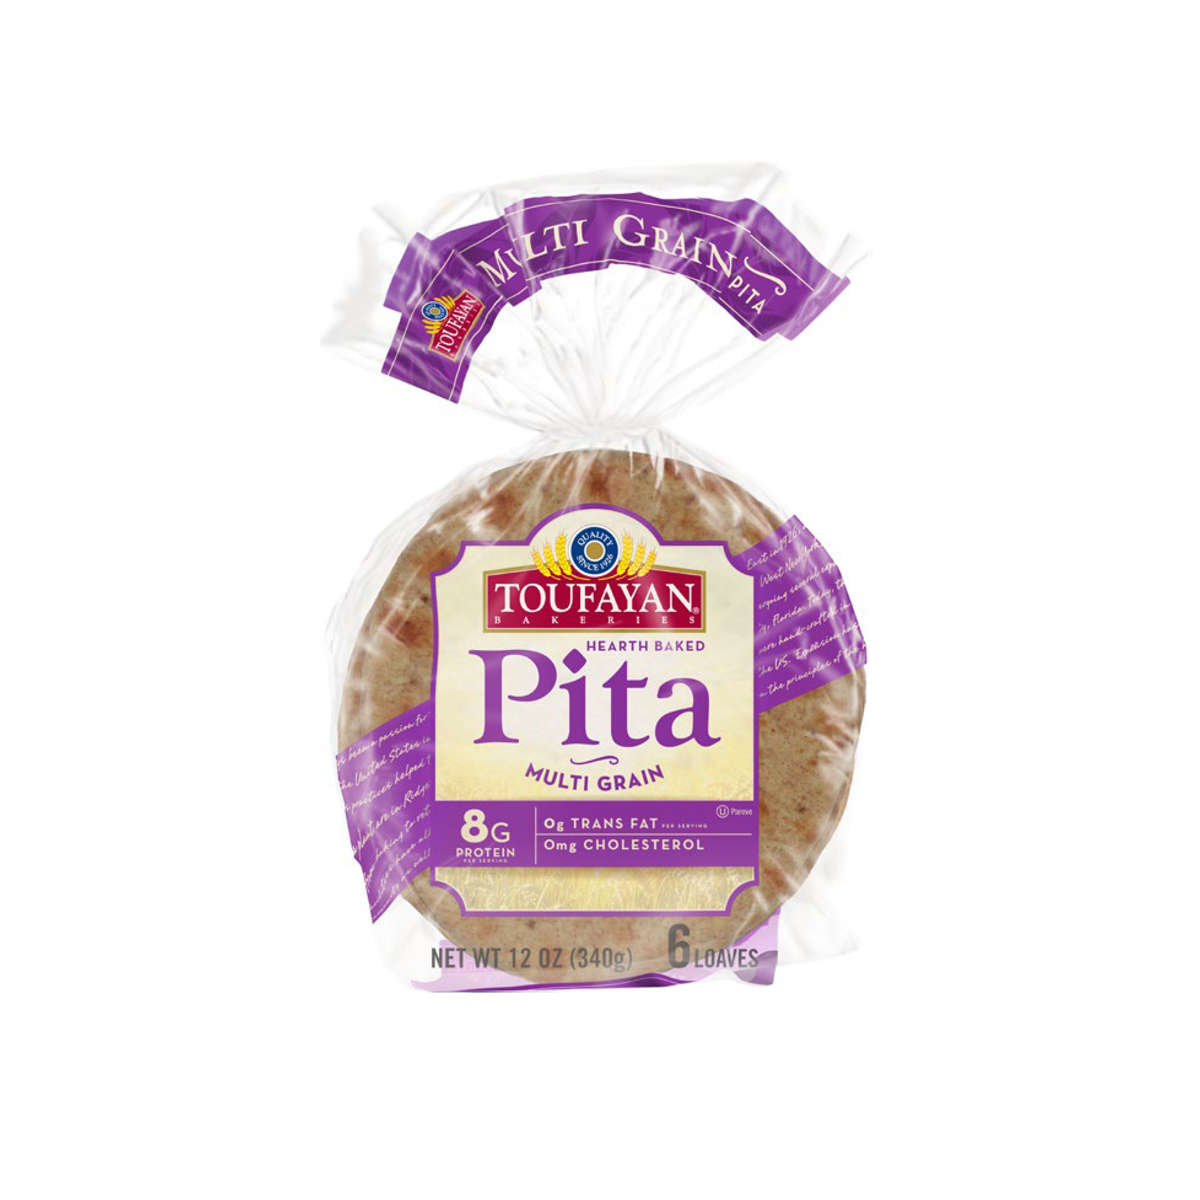 Pan Pita Multigrain